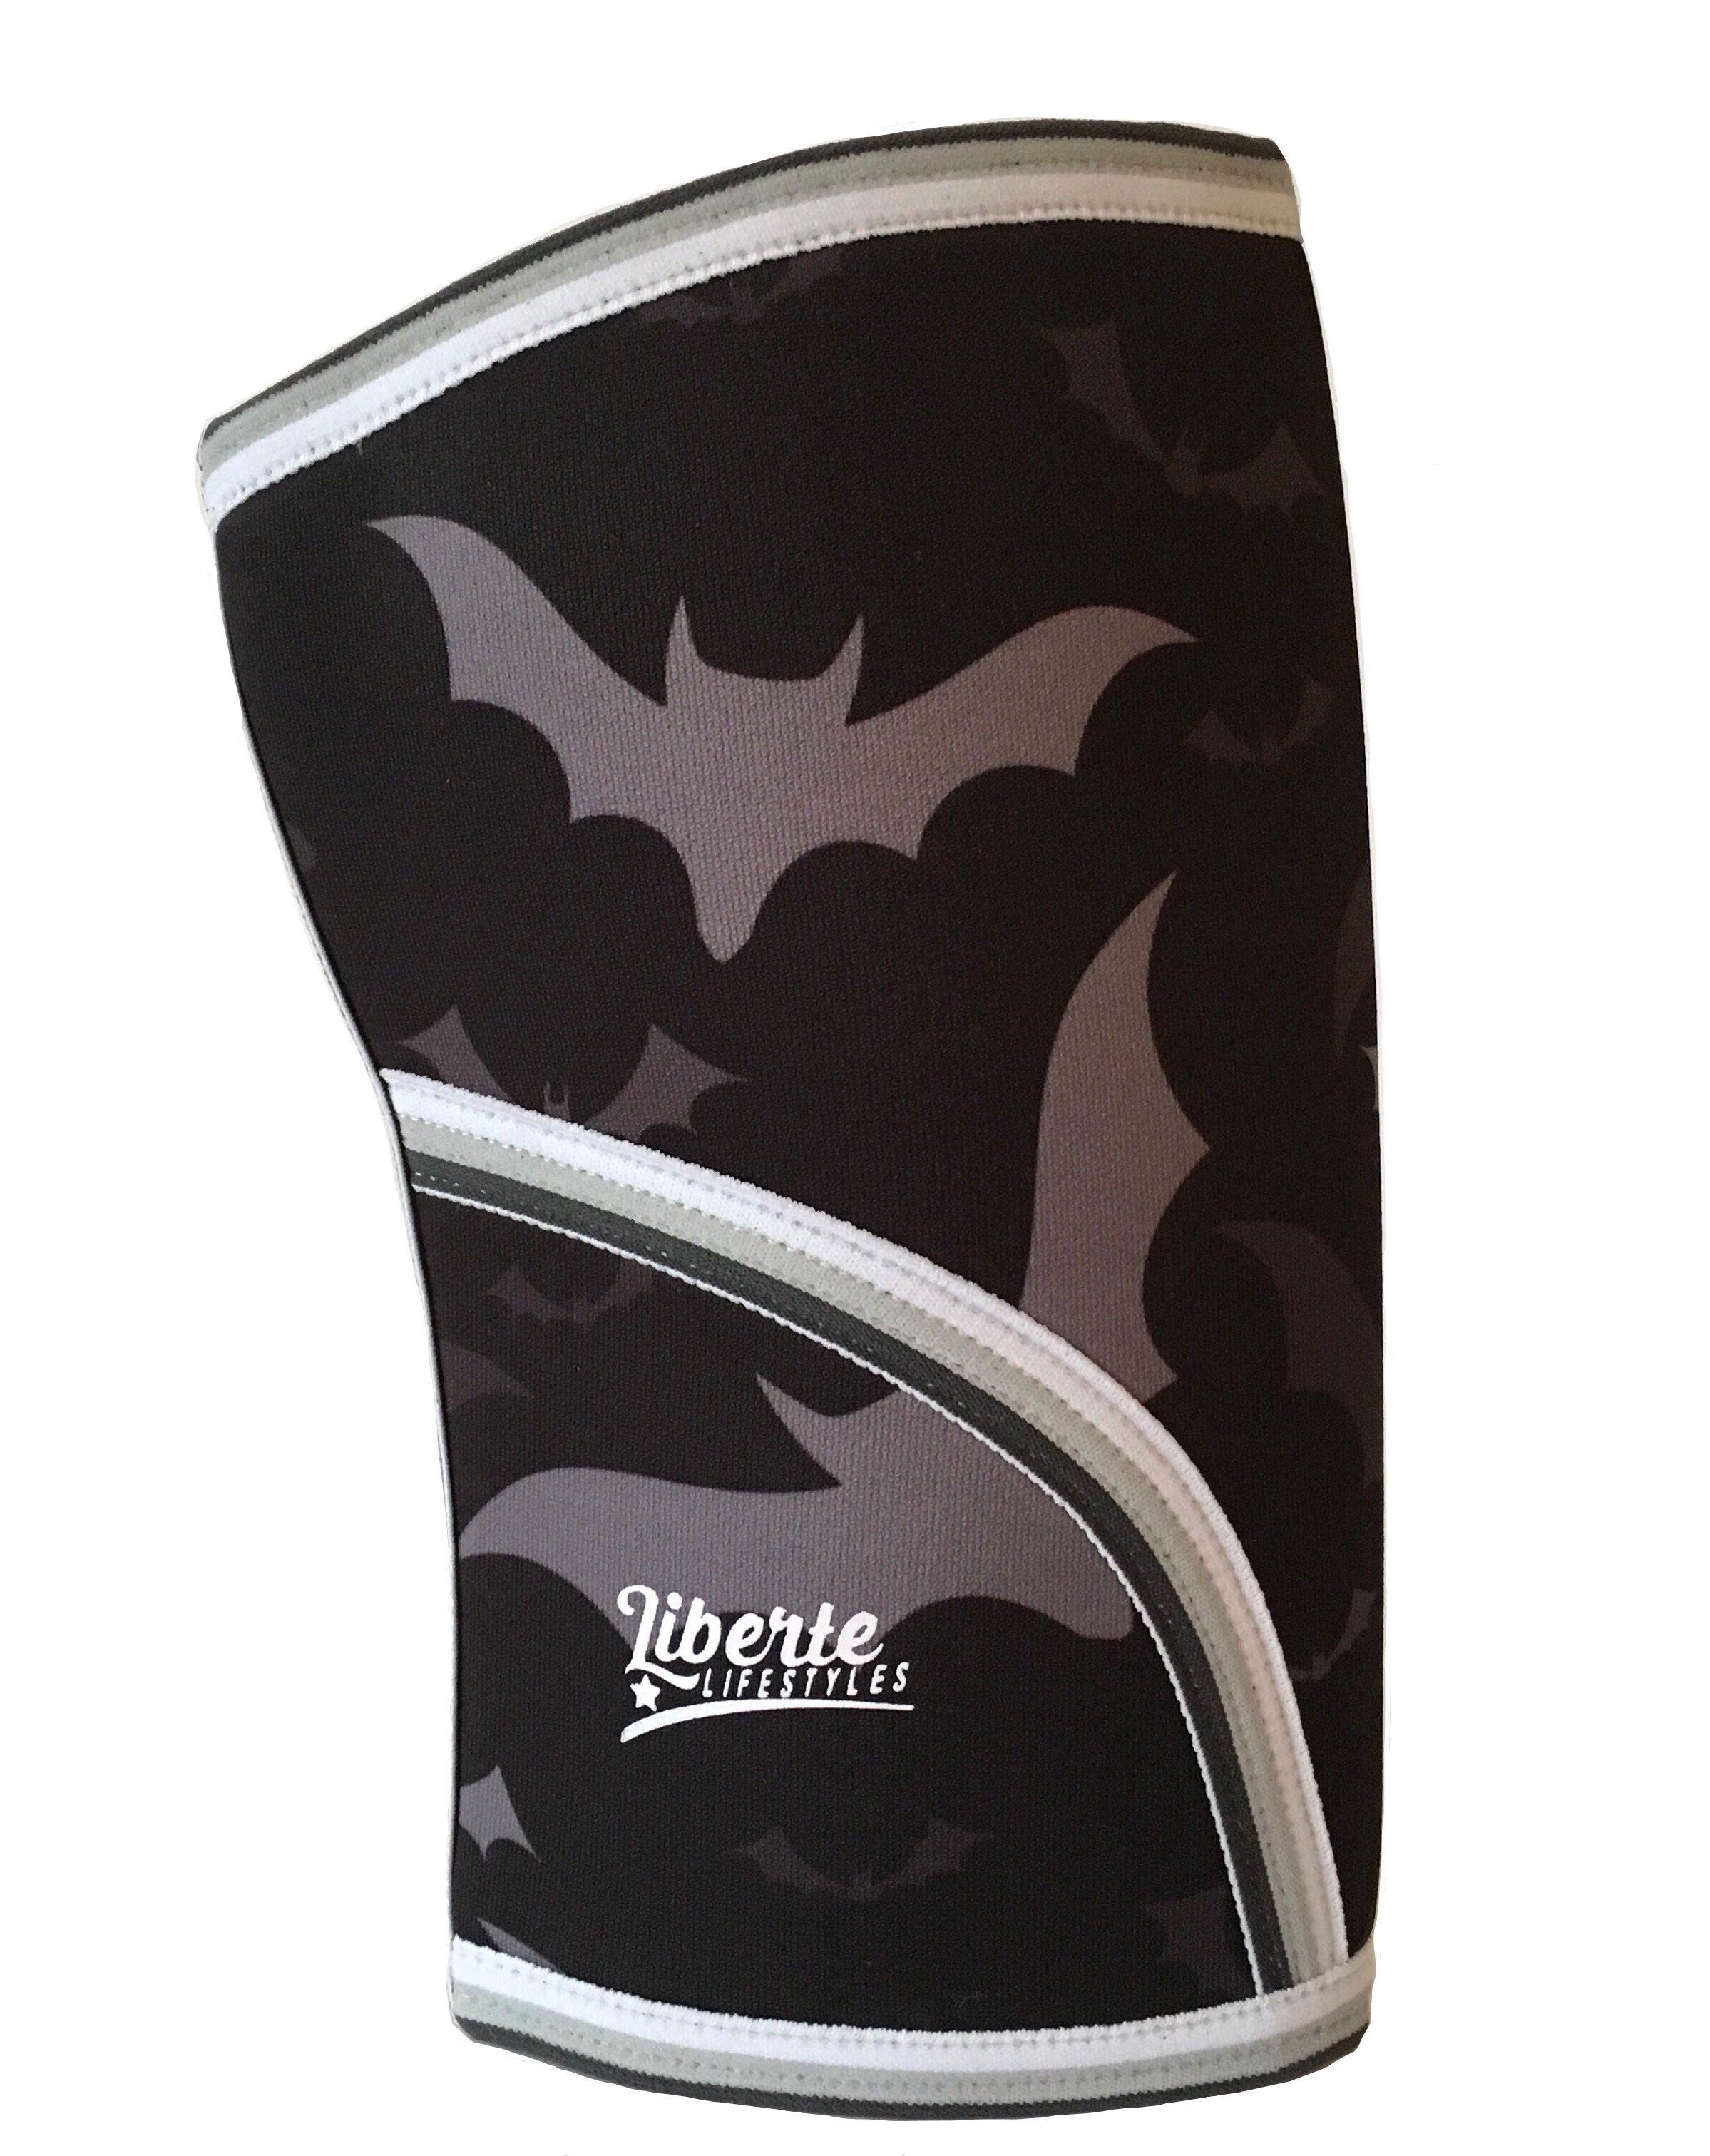 Liberte lifestyles bat print knee sleeves with images